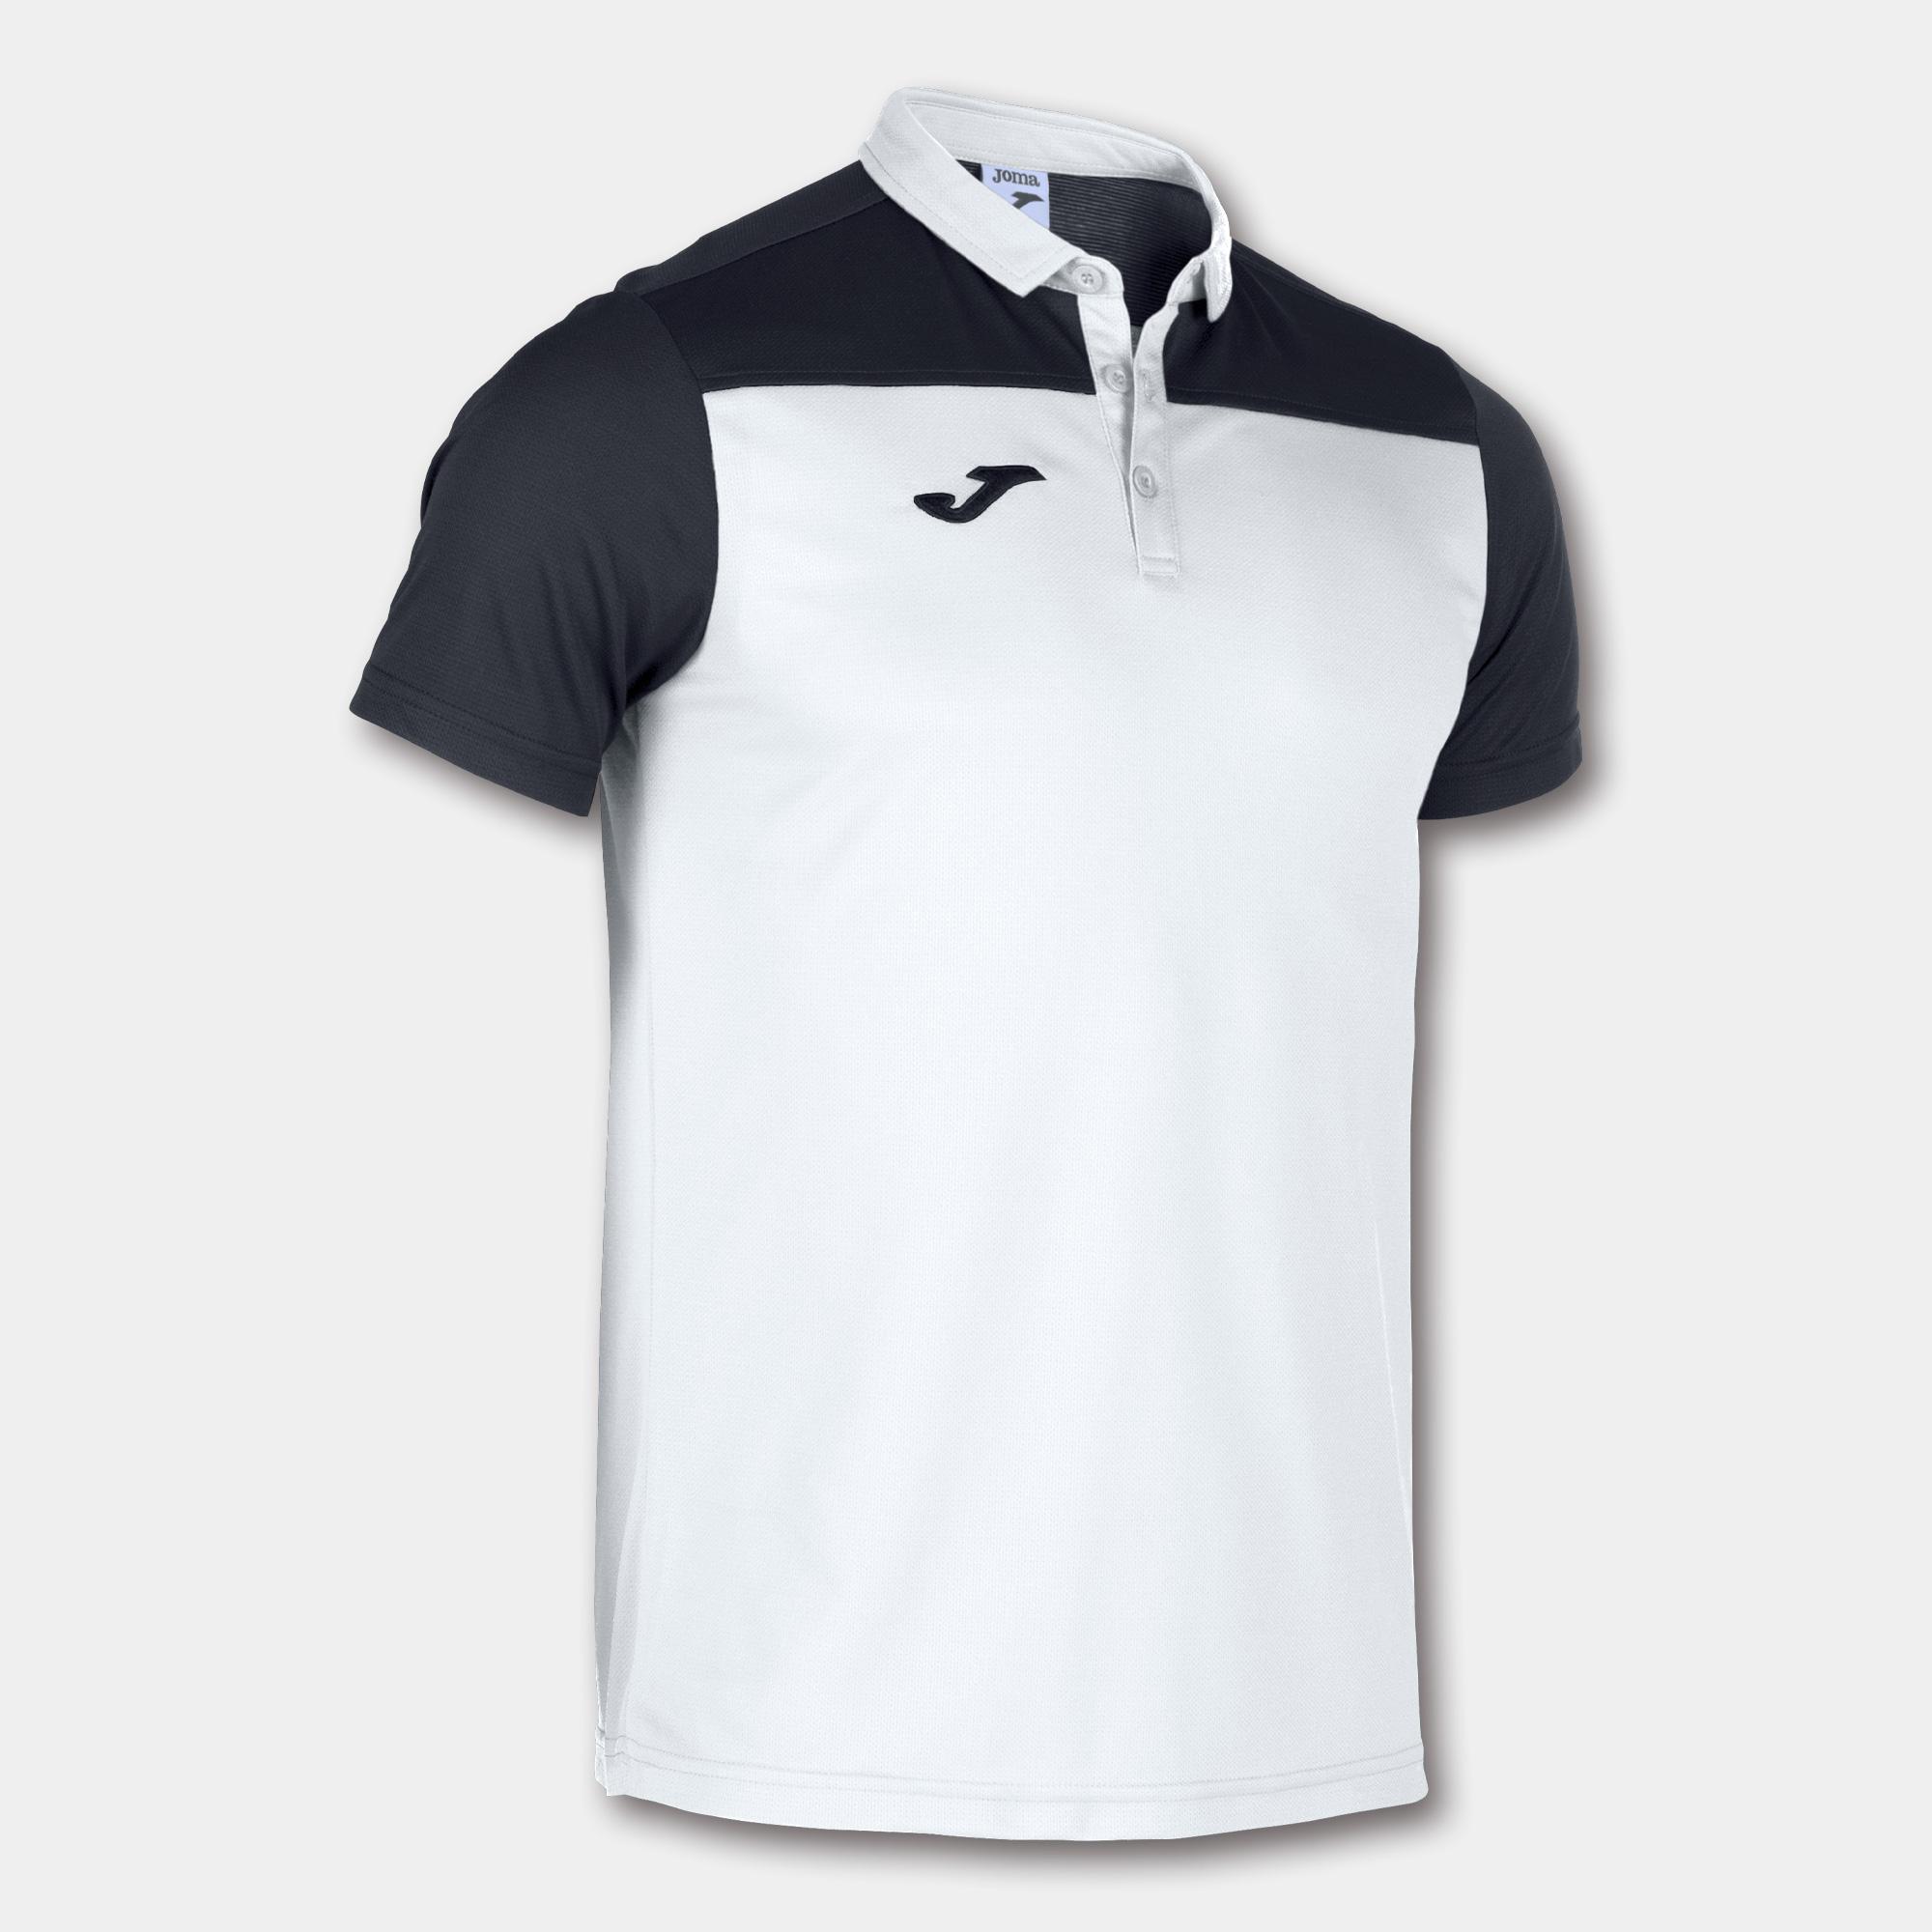 407f99f59 Joma Crew III Polo Shirt - Euro Soccer